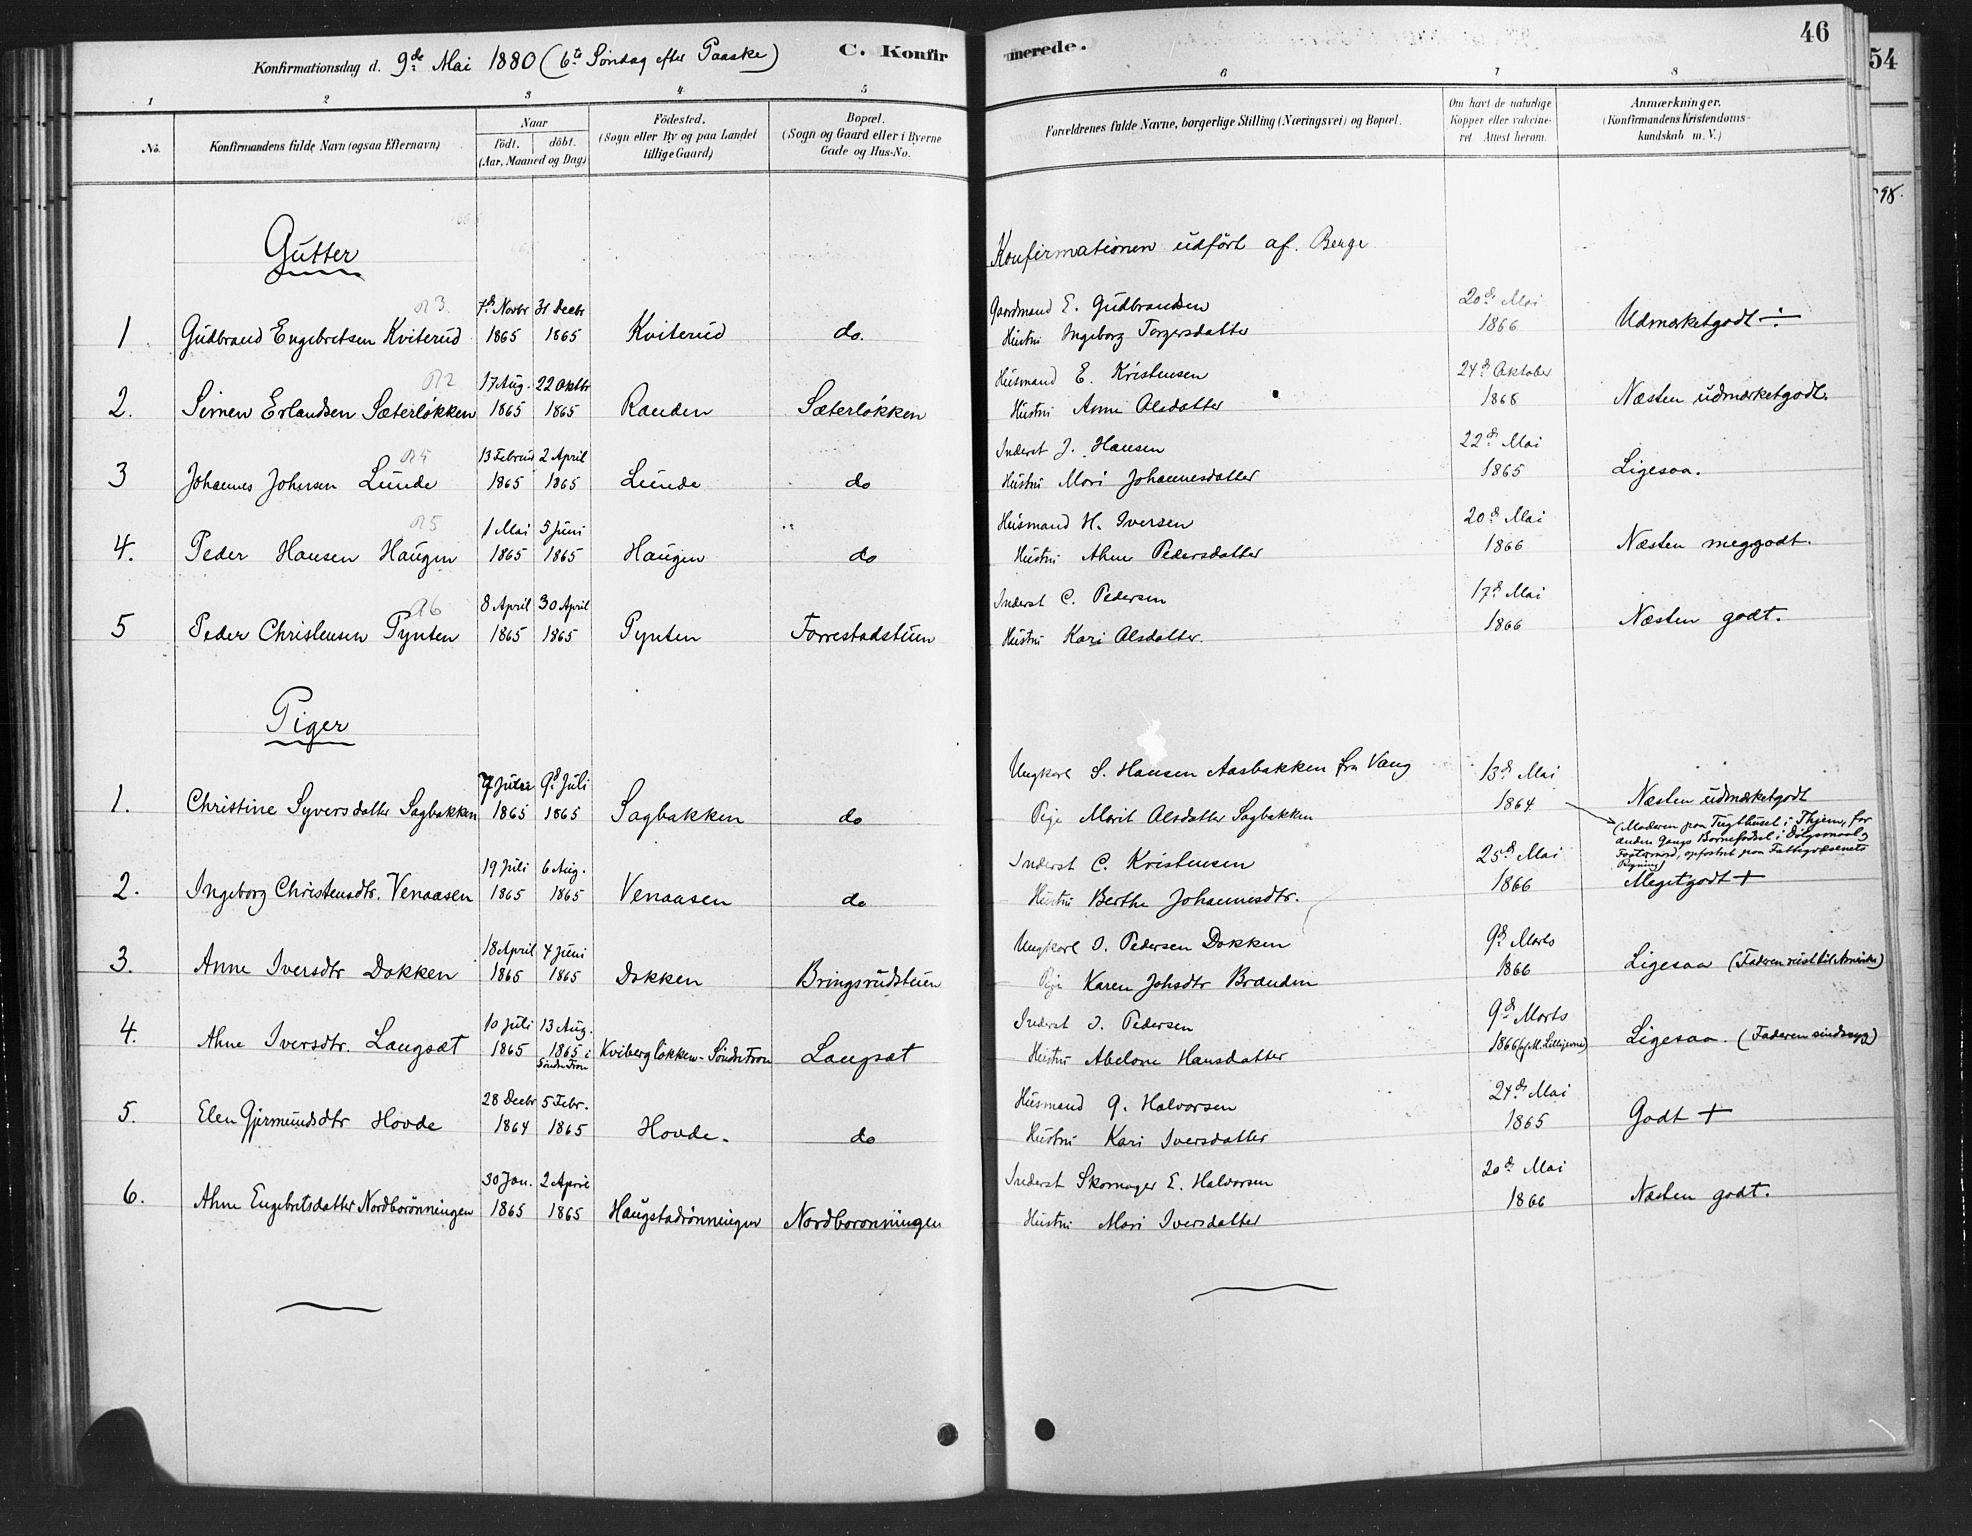 SAH, Ringebu prestekontor, Ministerialbok nr. 10, 1878-1898, s. 46